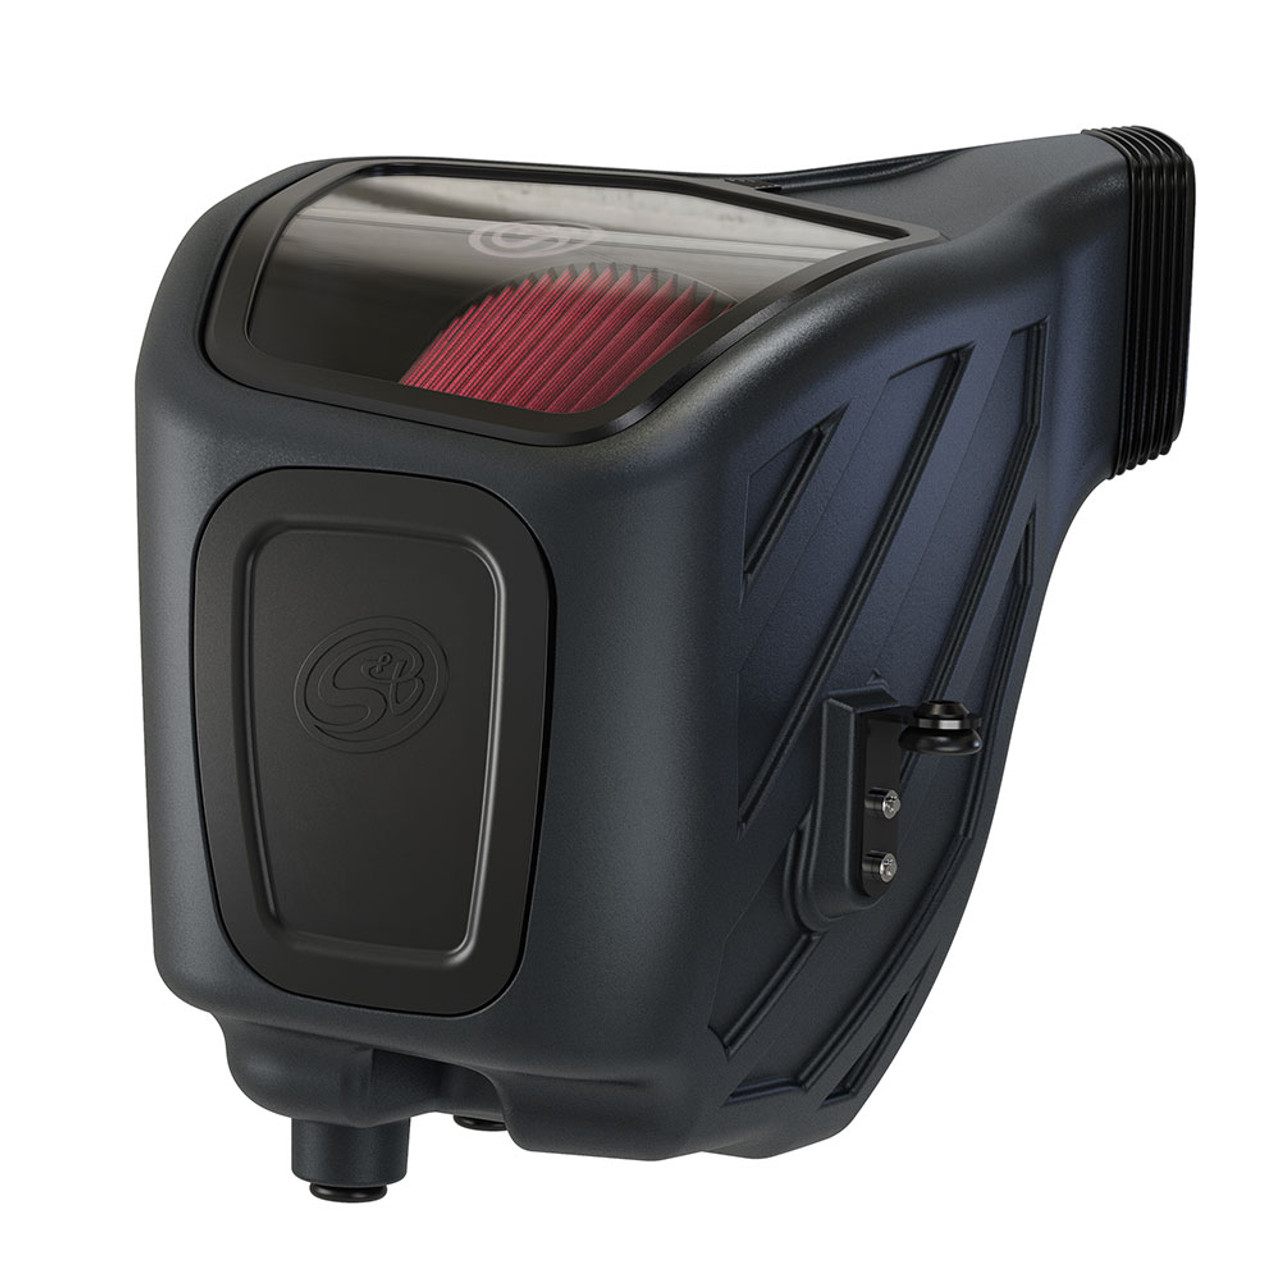 S&B 75-5133 Cold Air Intake For 19-20 Dodge Ram 2500/3500 6.4L HEMI